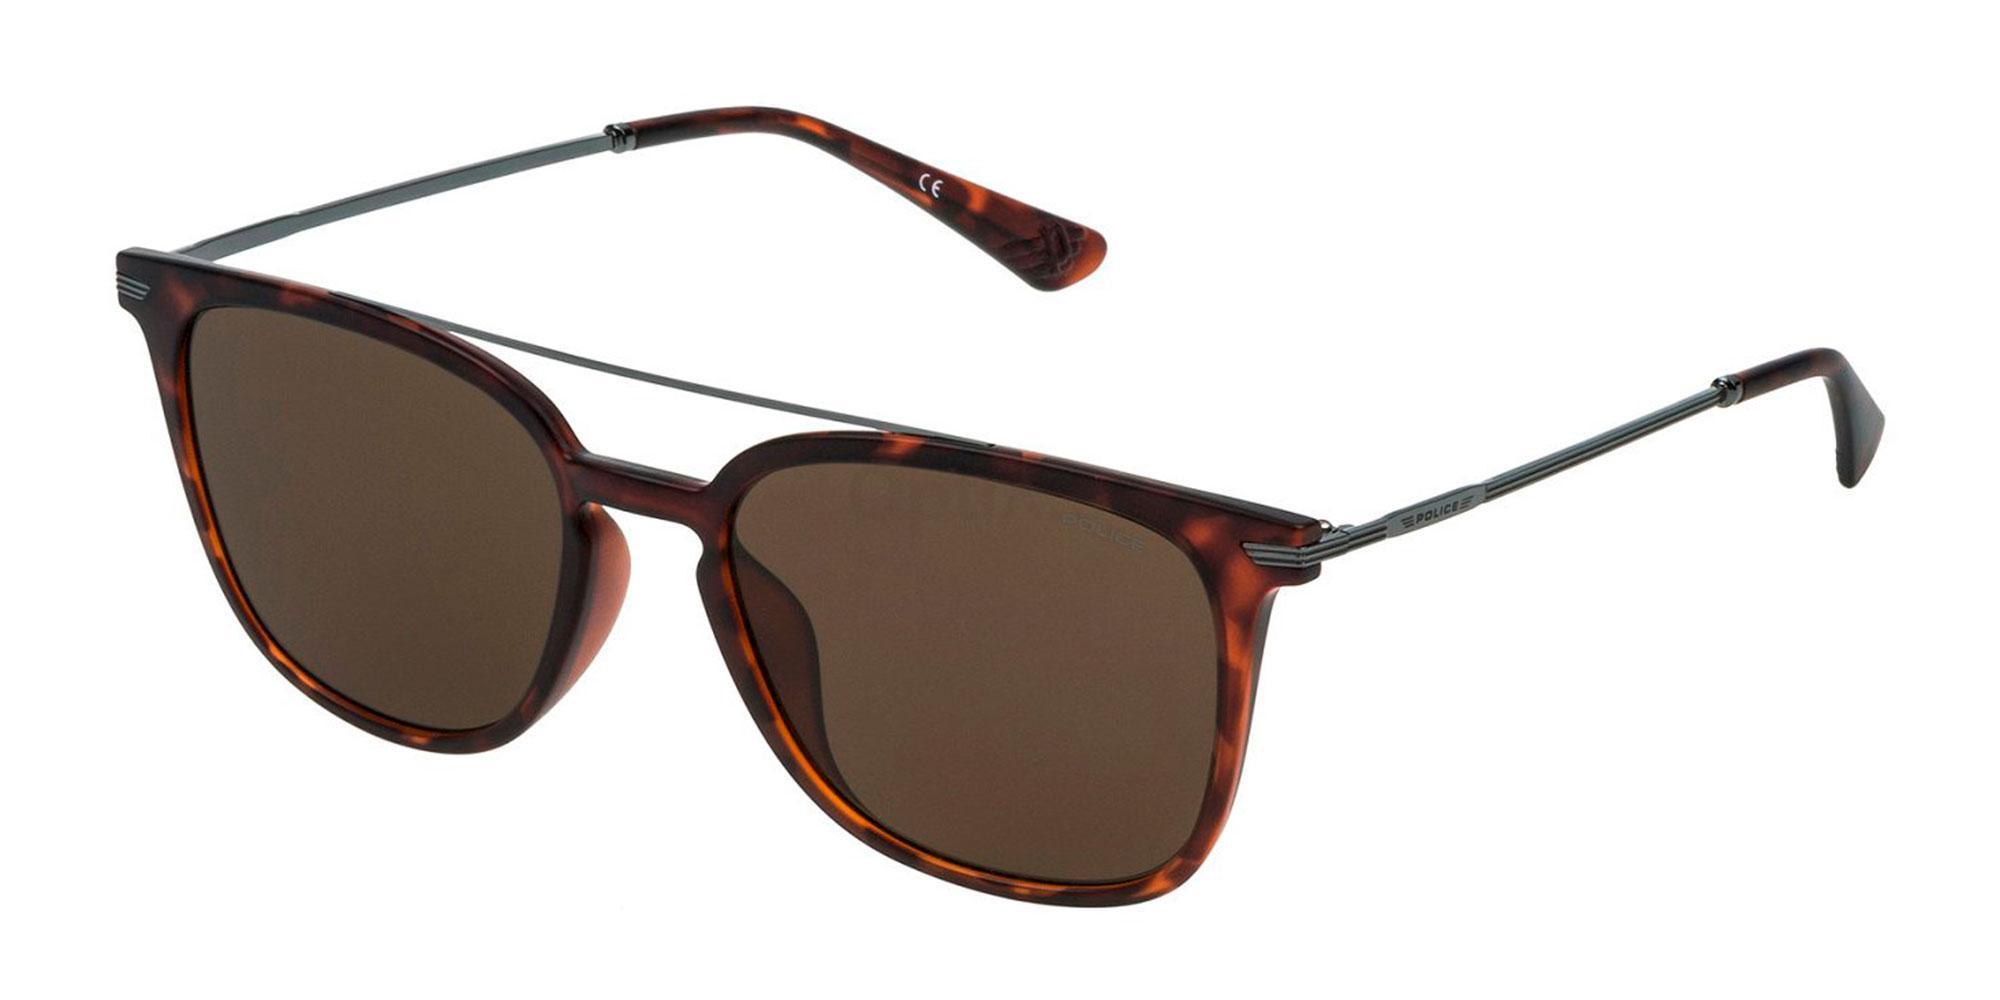 07R4 SPL360 Sunglasses, Police